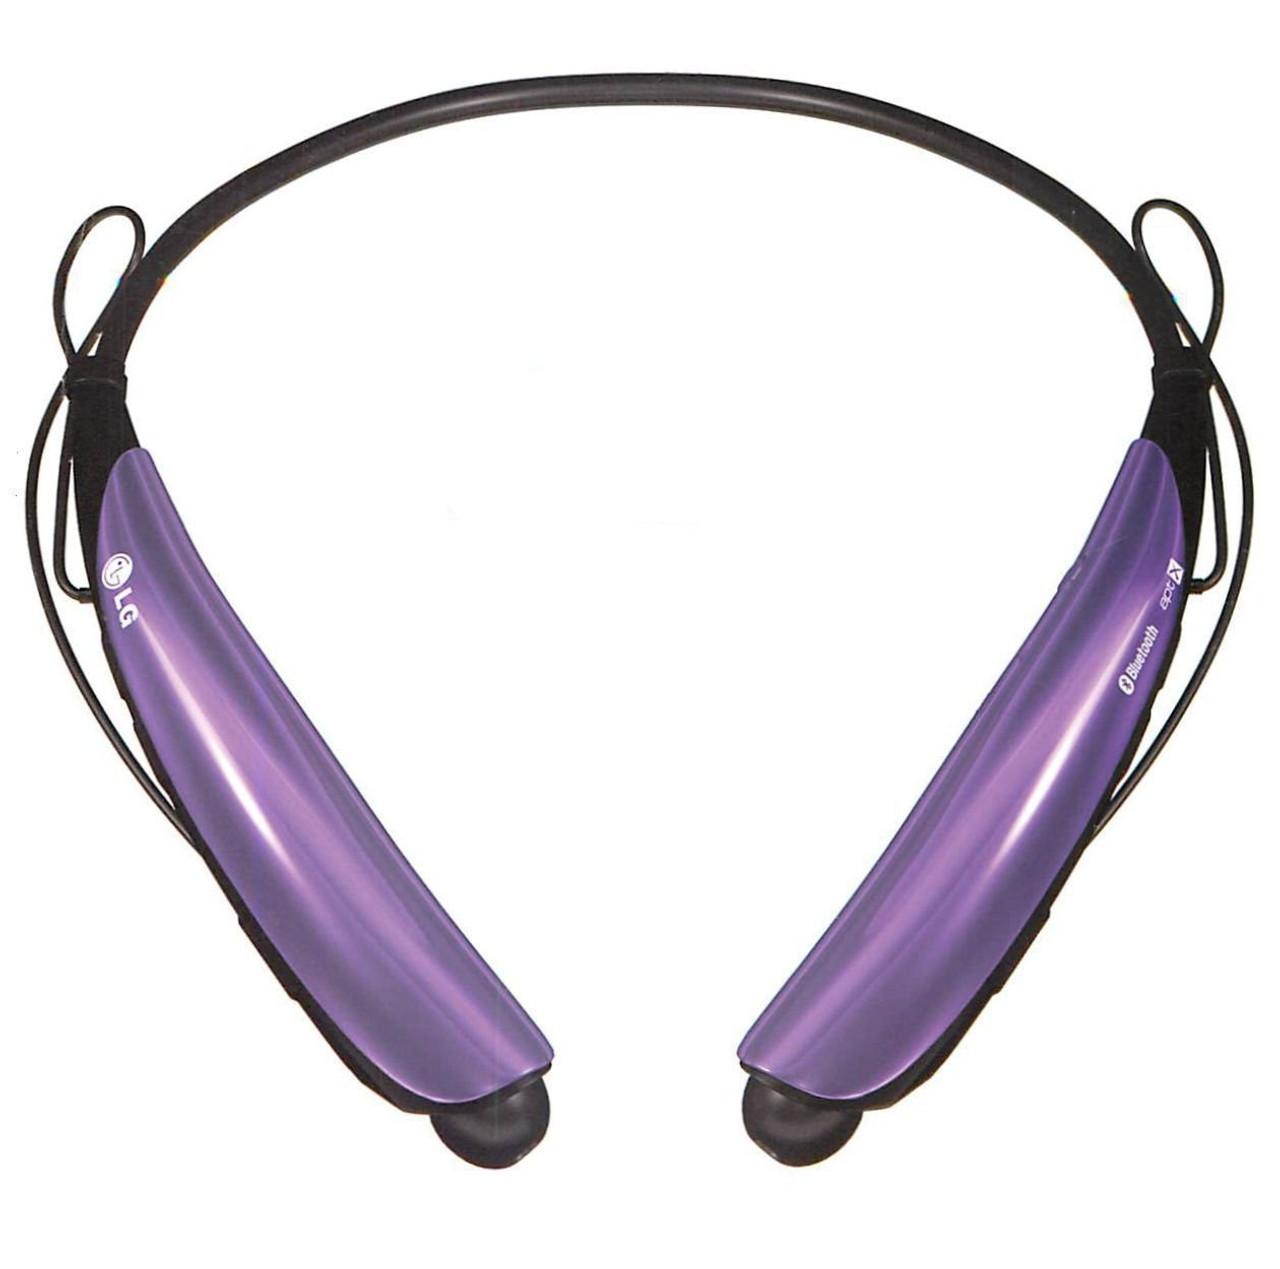 7fd8b00f53b LG Tone Pro HBS-750 Purple Bluetooth Stereo Headset - eSureBuy.com